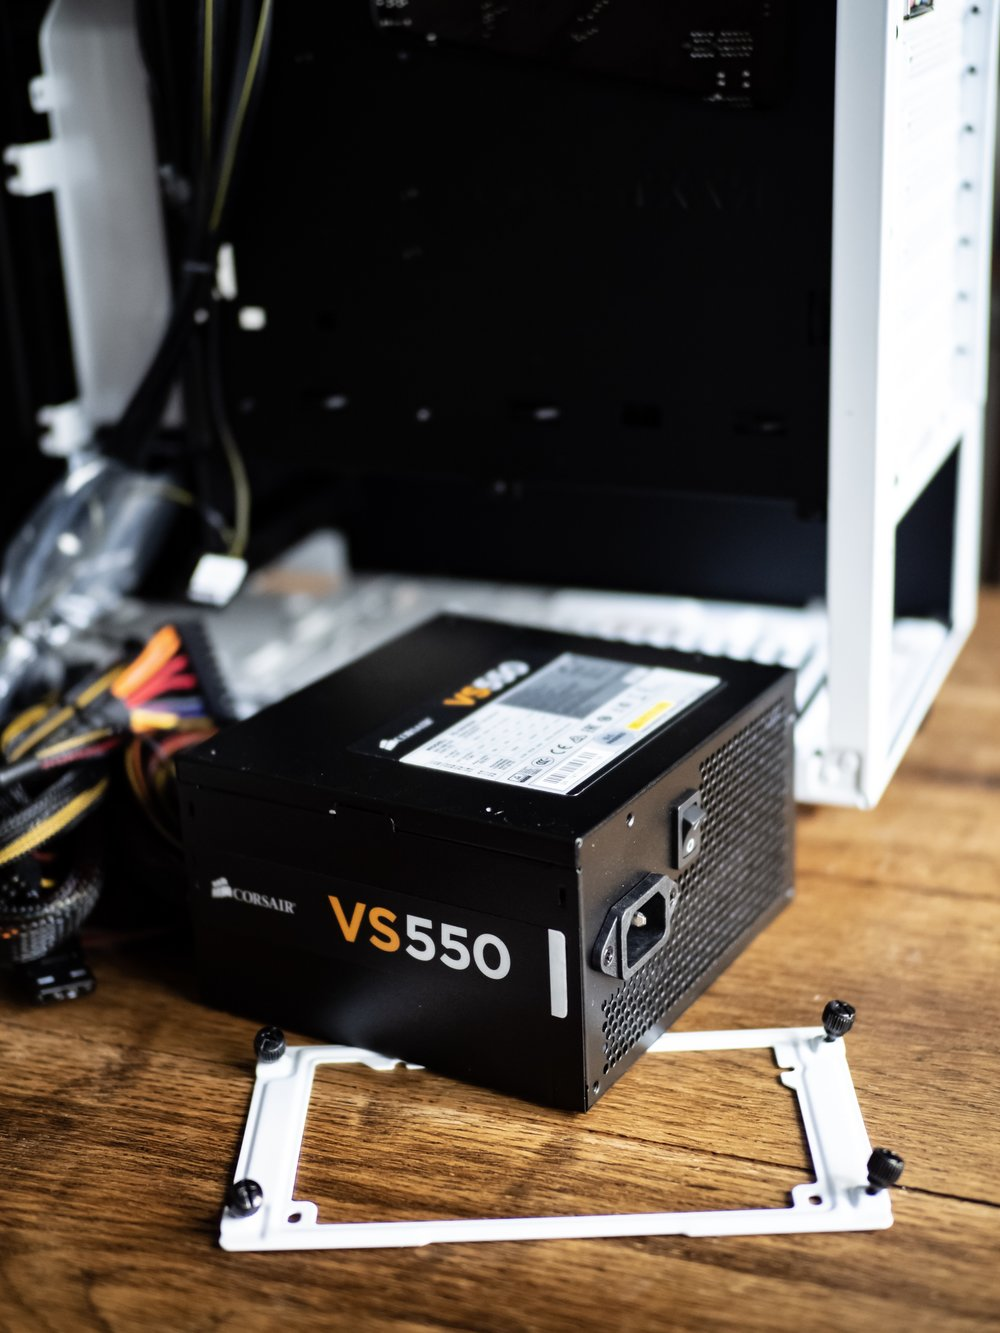 Gaming PC Build Corsair VS550 PSU Power Supply Unit